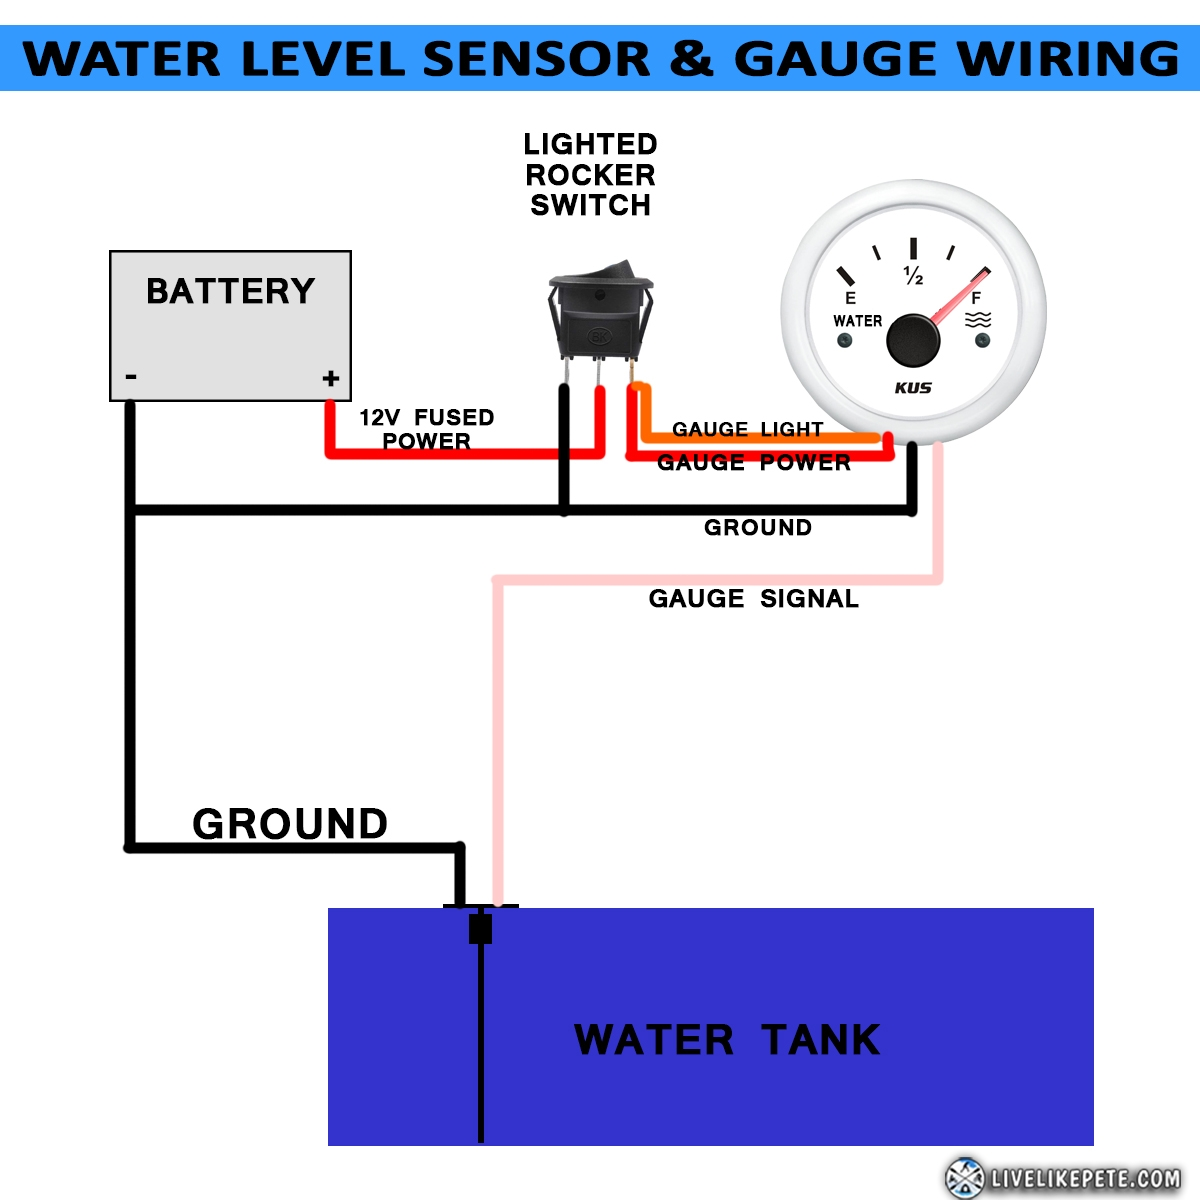 Fresh Water Tank Level Sensor And Gauge, Kus Fuel Gauge Wiring Diagram